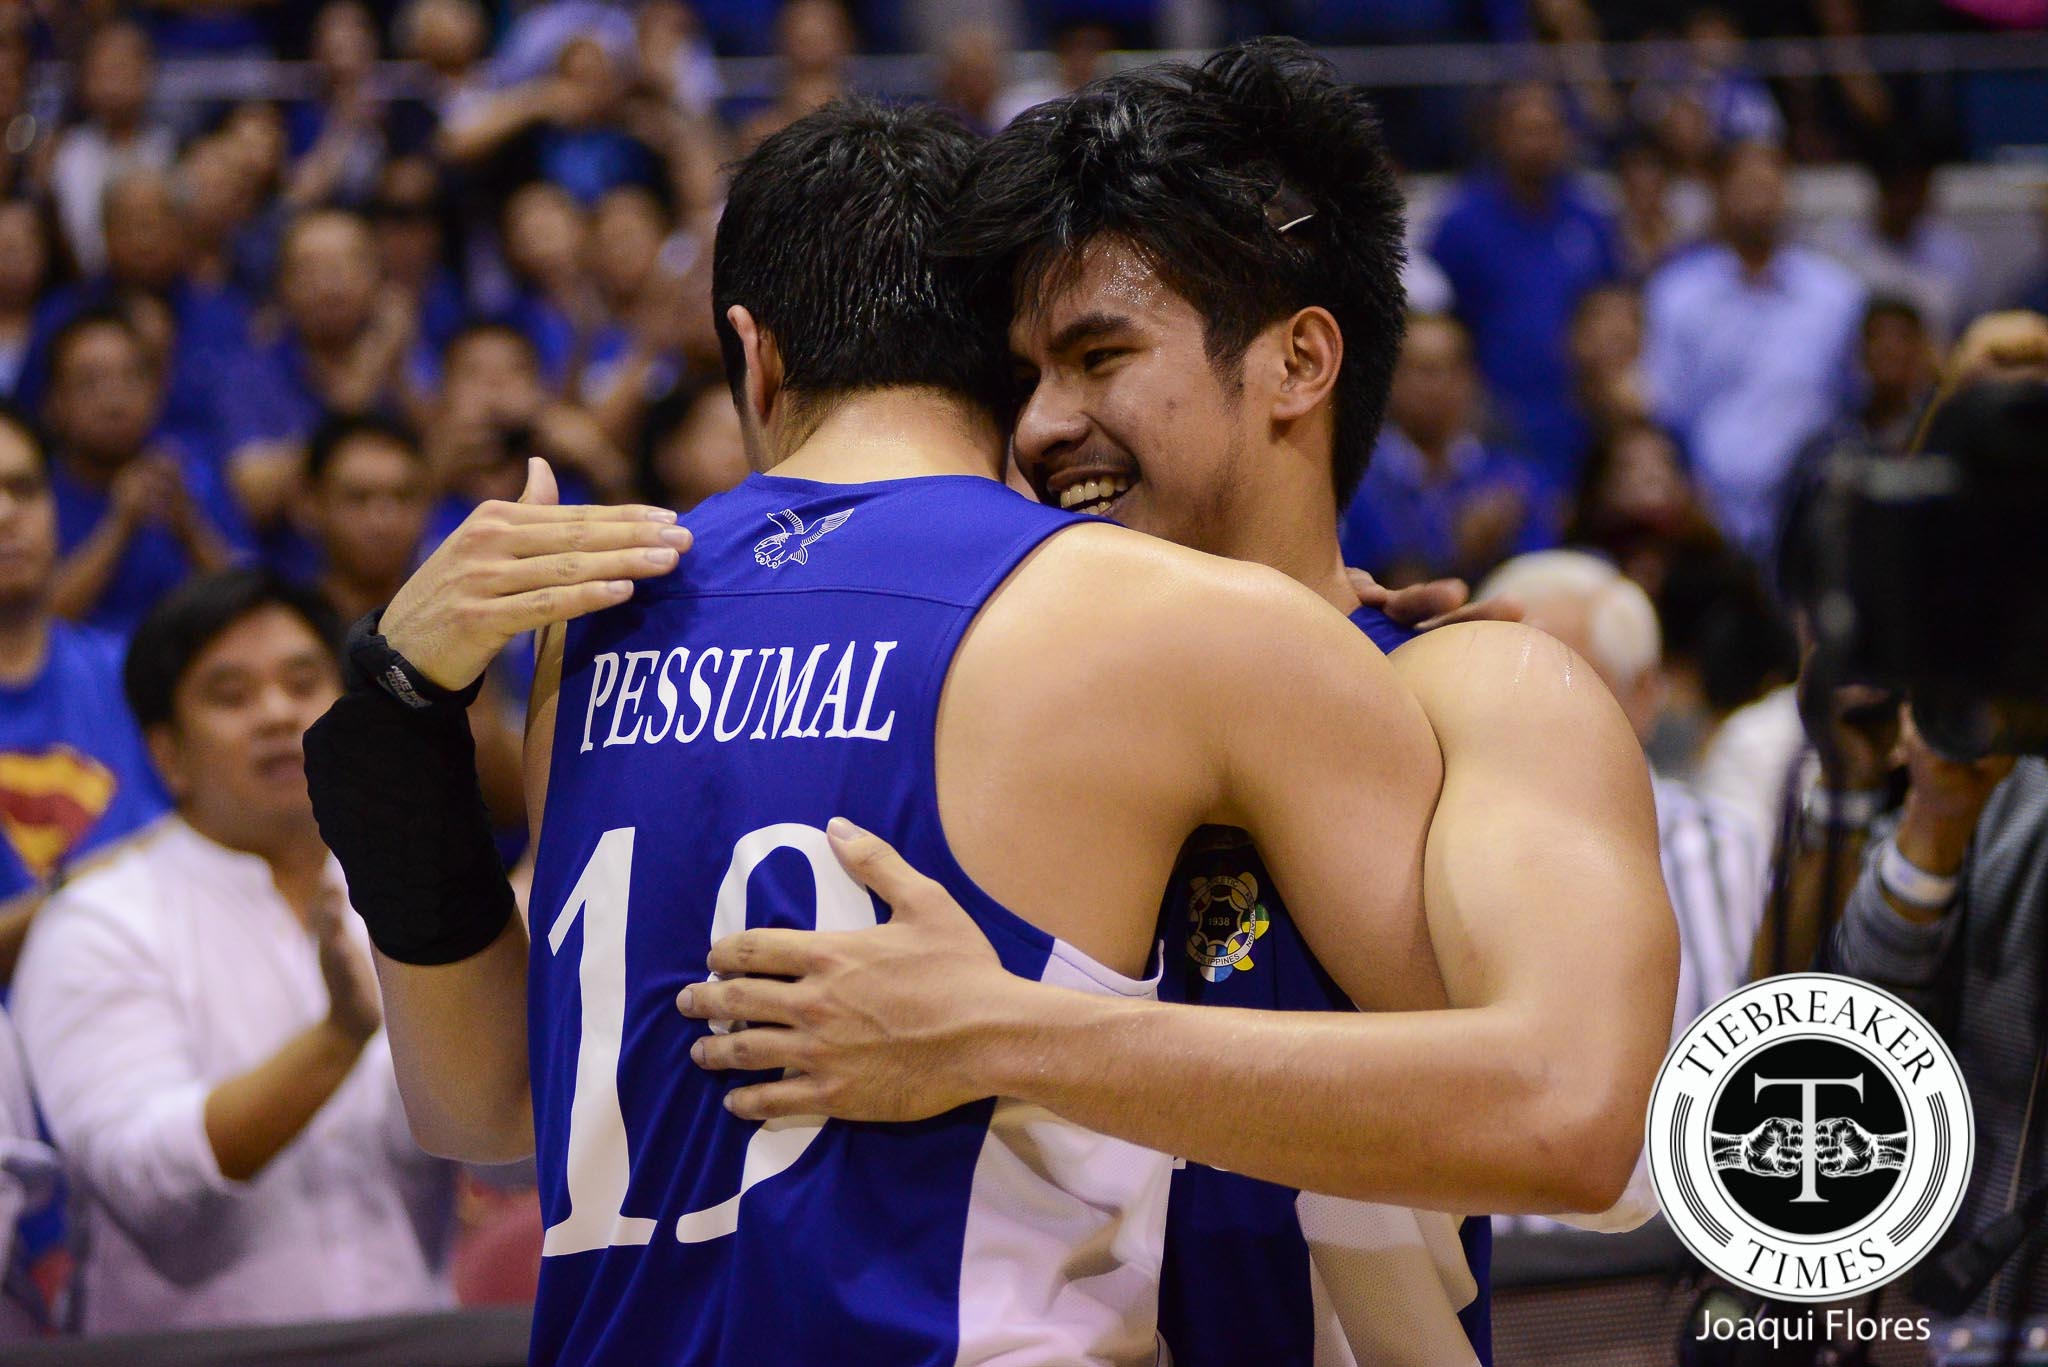 UAAP-78-Final-Four-FEU-vs.-ADMU-Ravena-Pessumal-2953 Shiga-bound Kiefer Ravena grateful to PBA Board for support Basketball News PBA  - philippine sports news